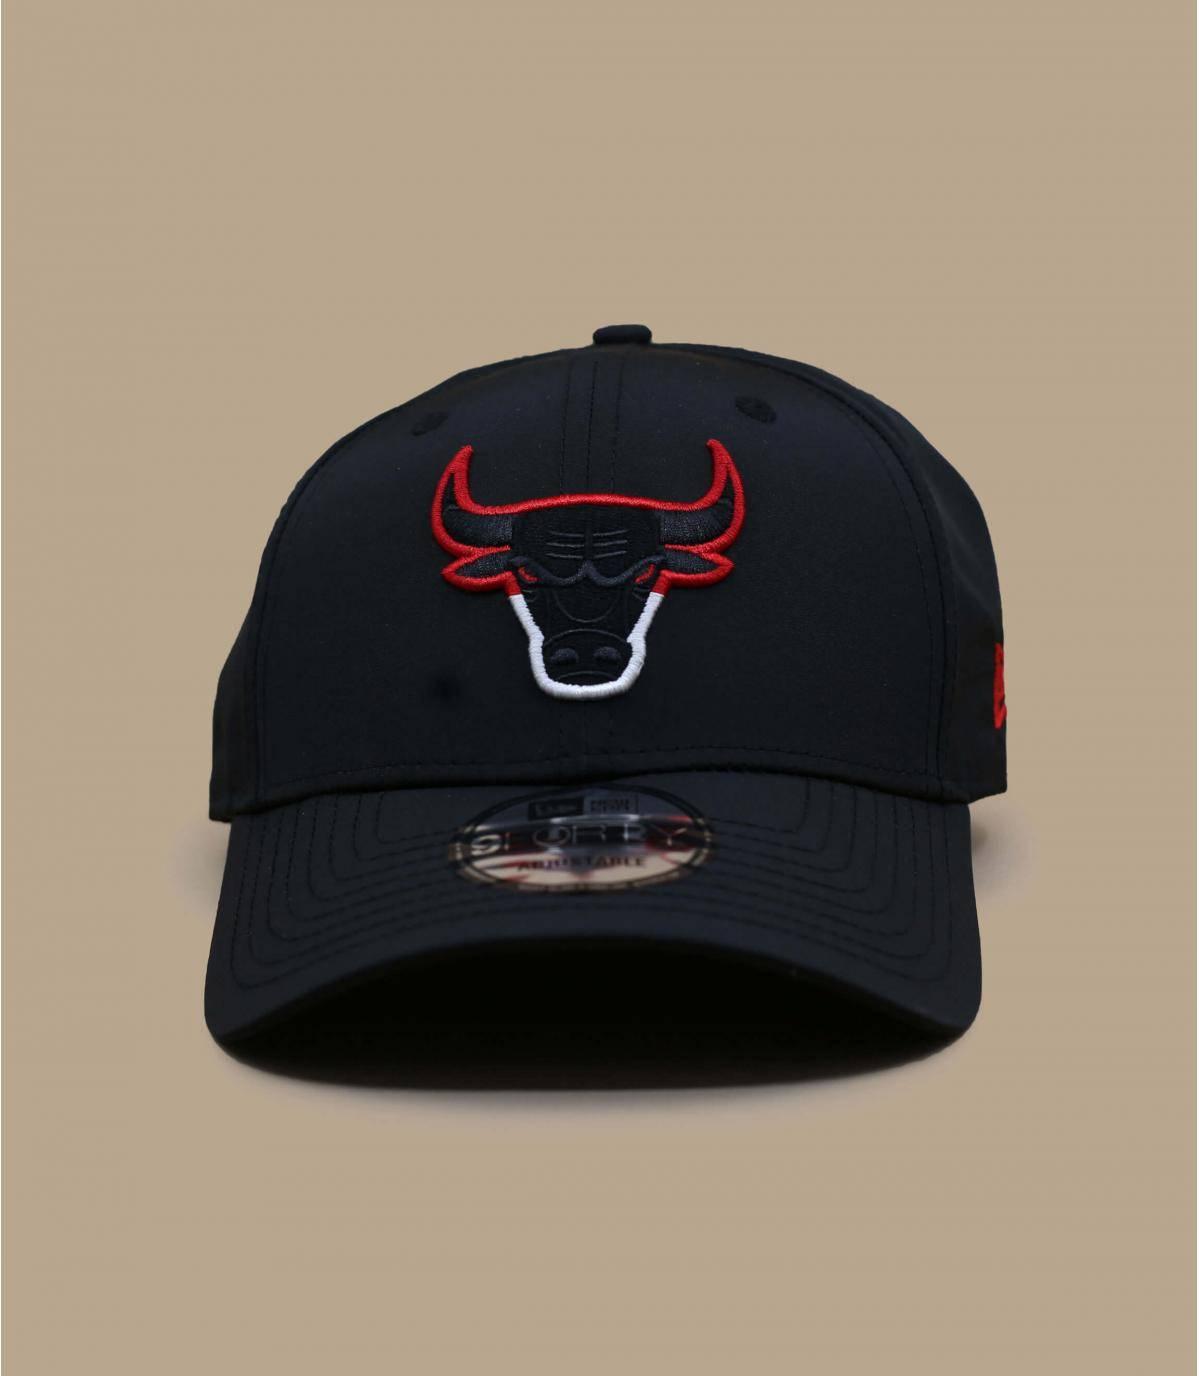 Details Two Tone 940 Bulls - afbeeling 2